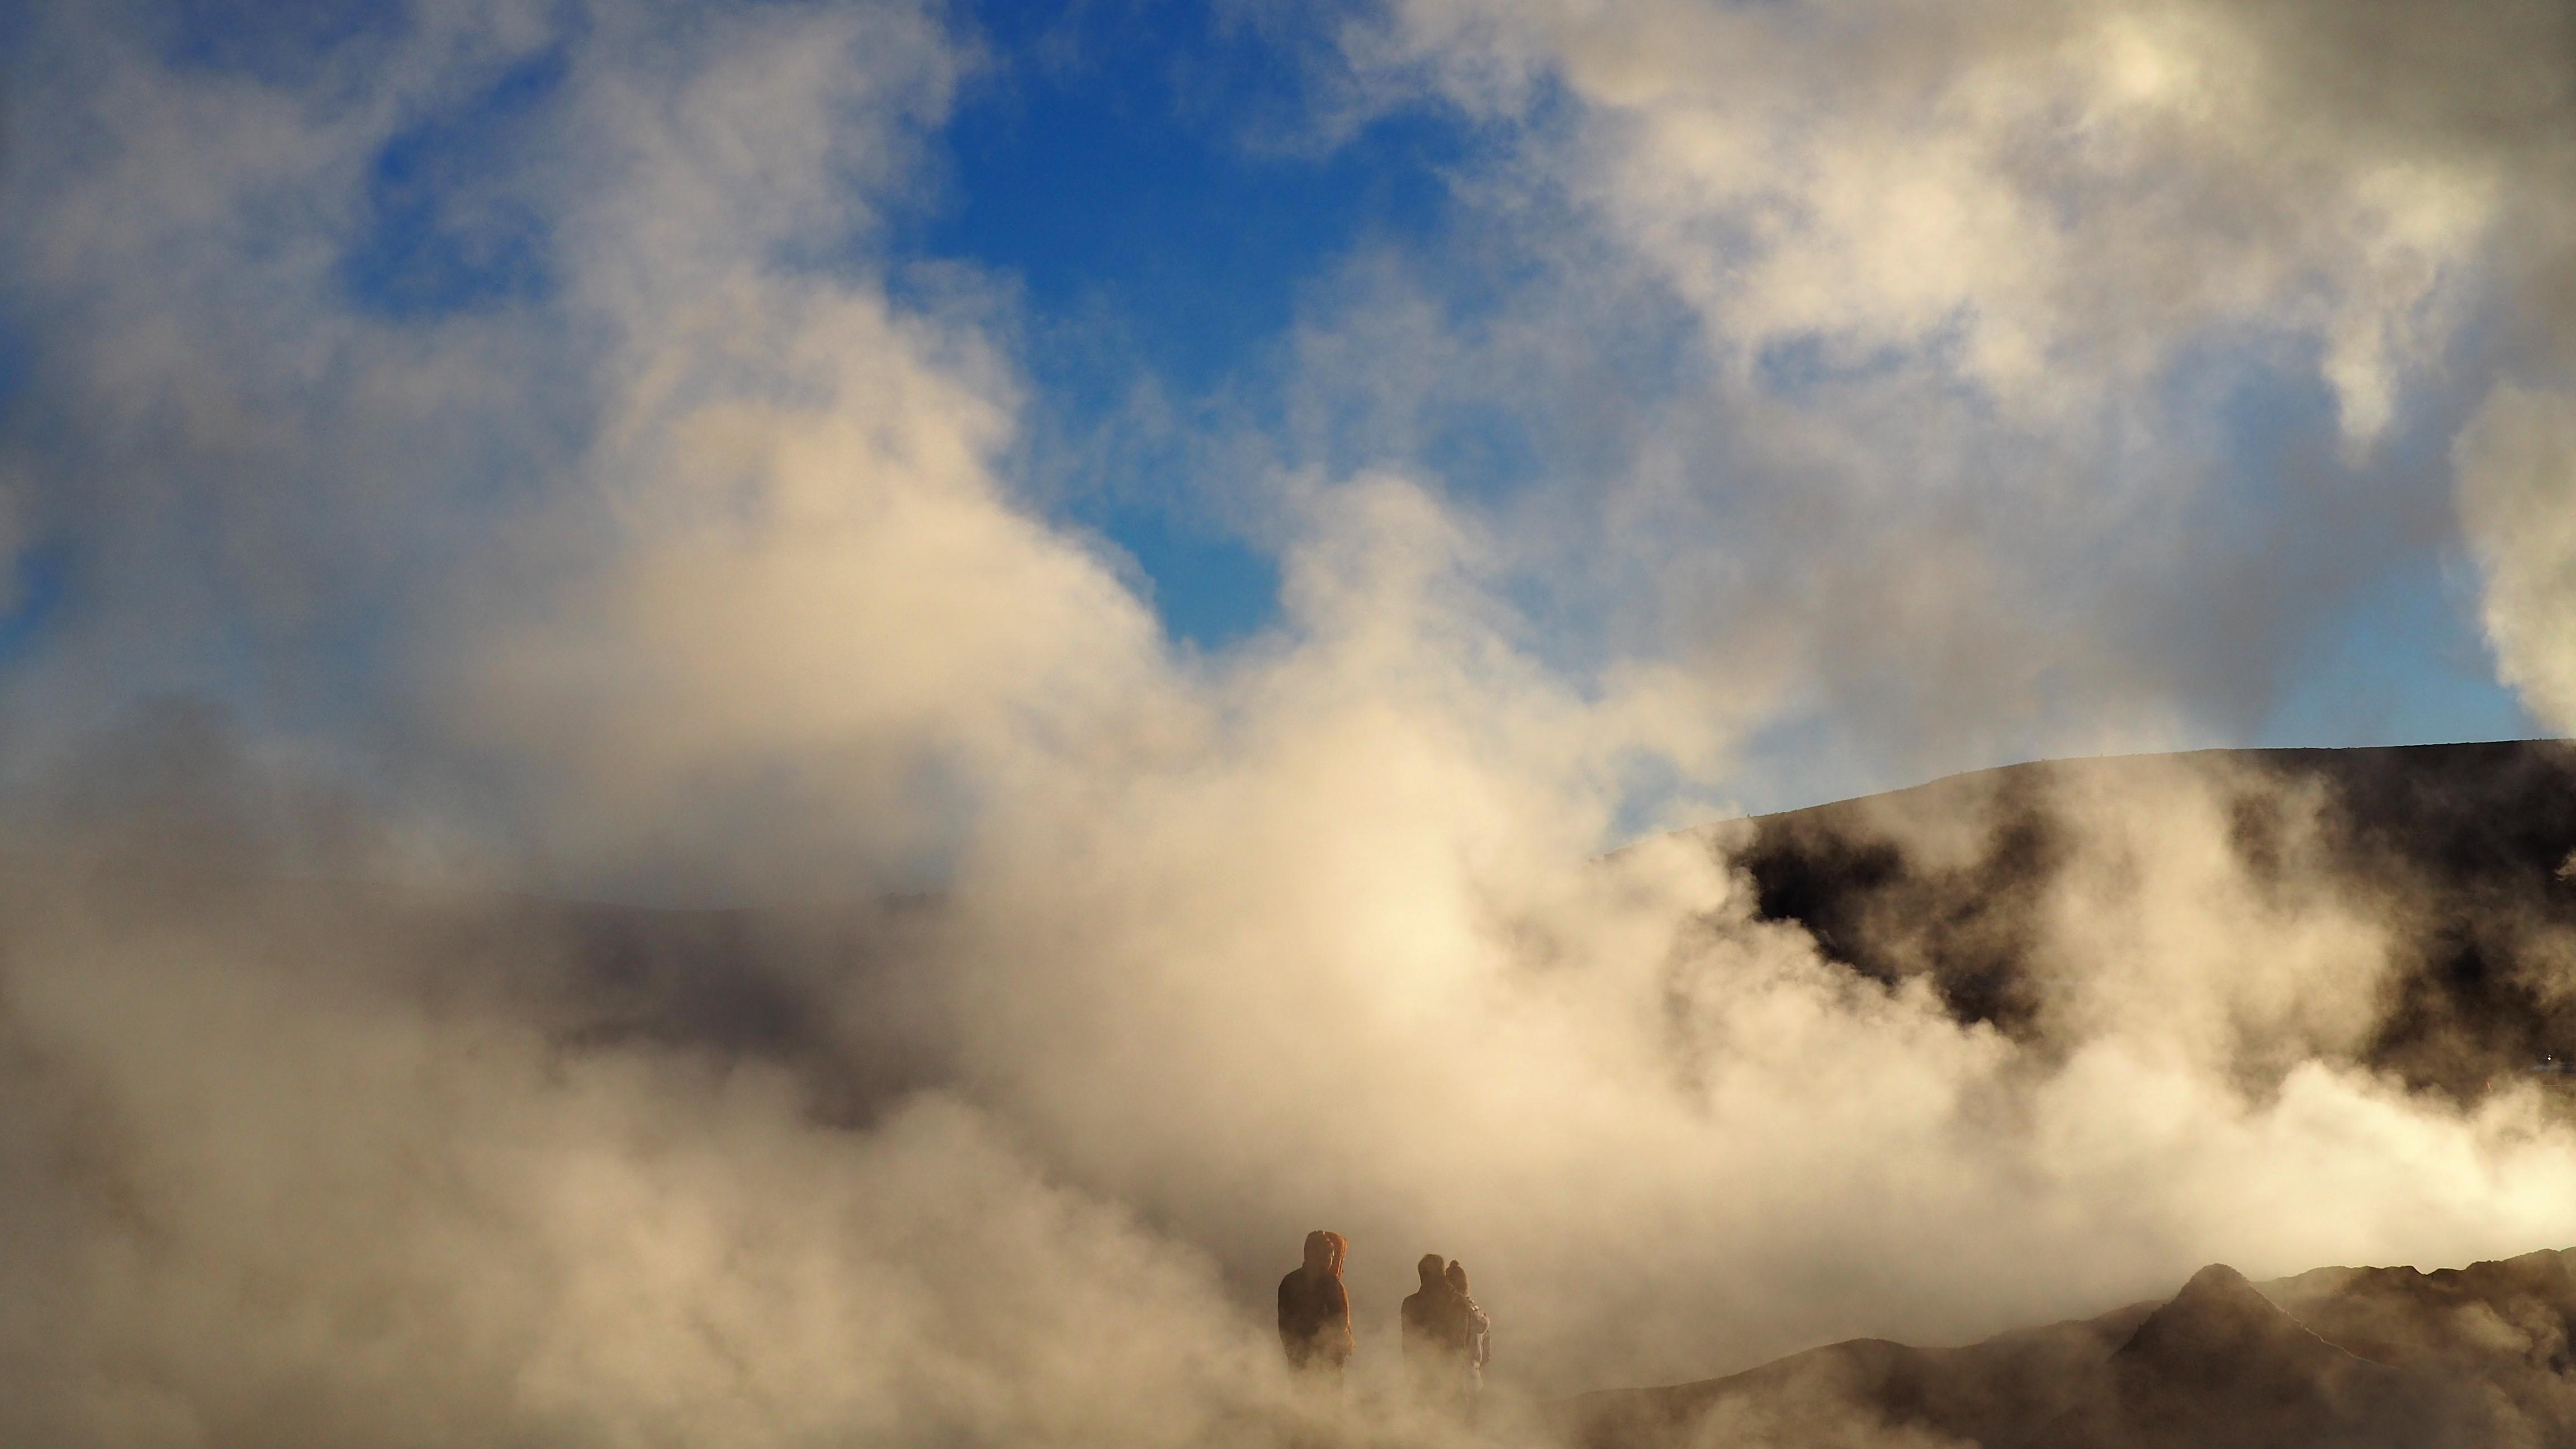 sol de mañana geisers (geysers)